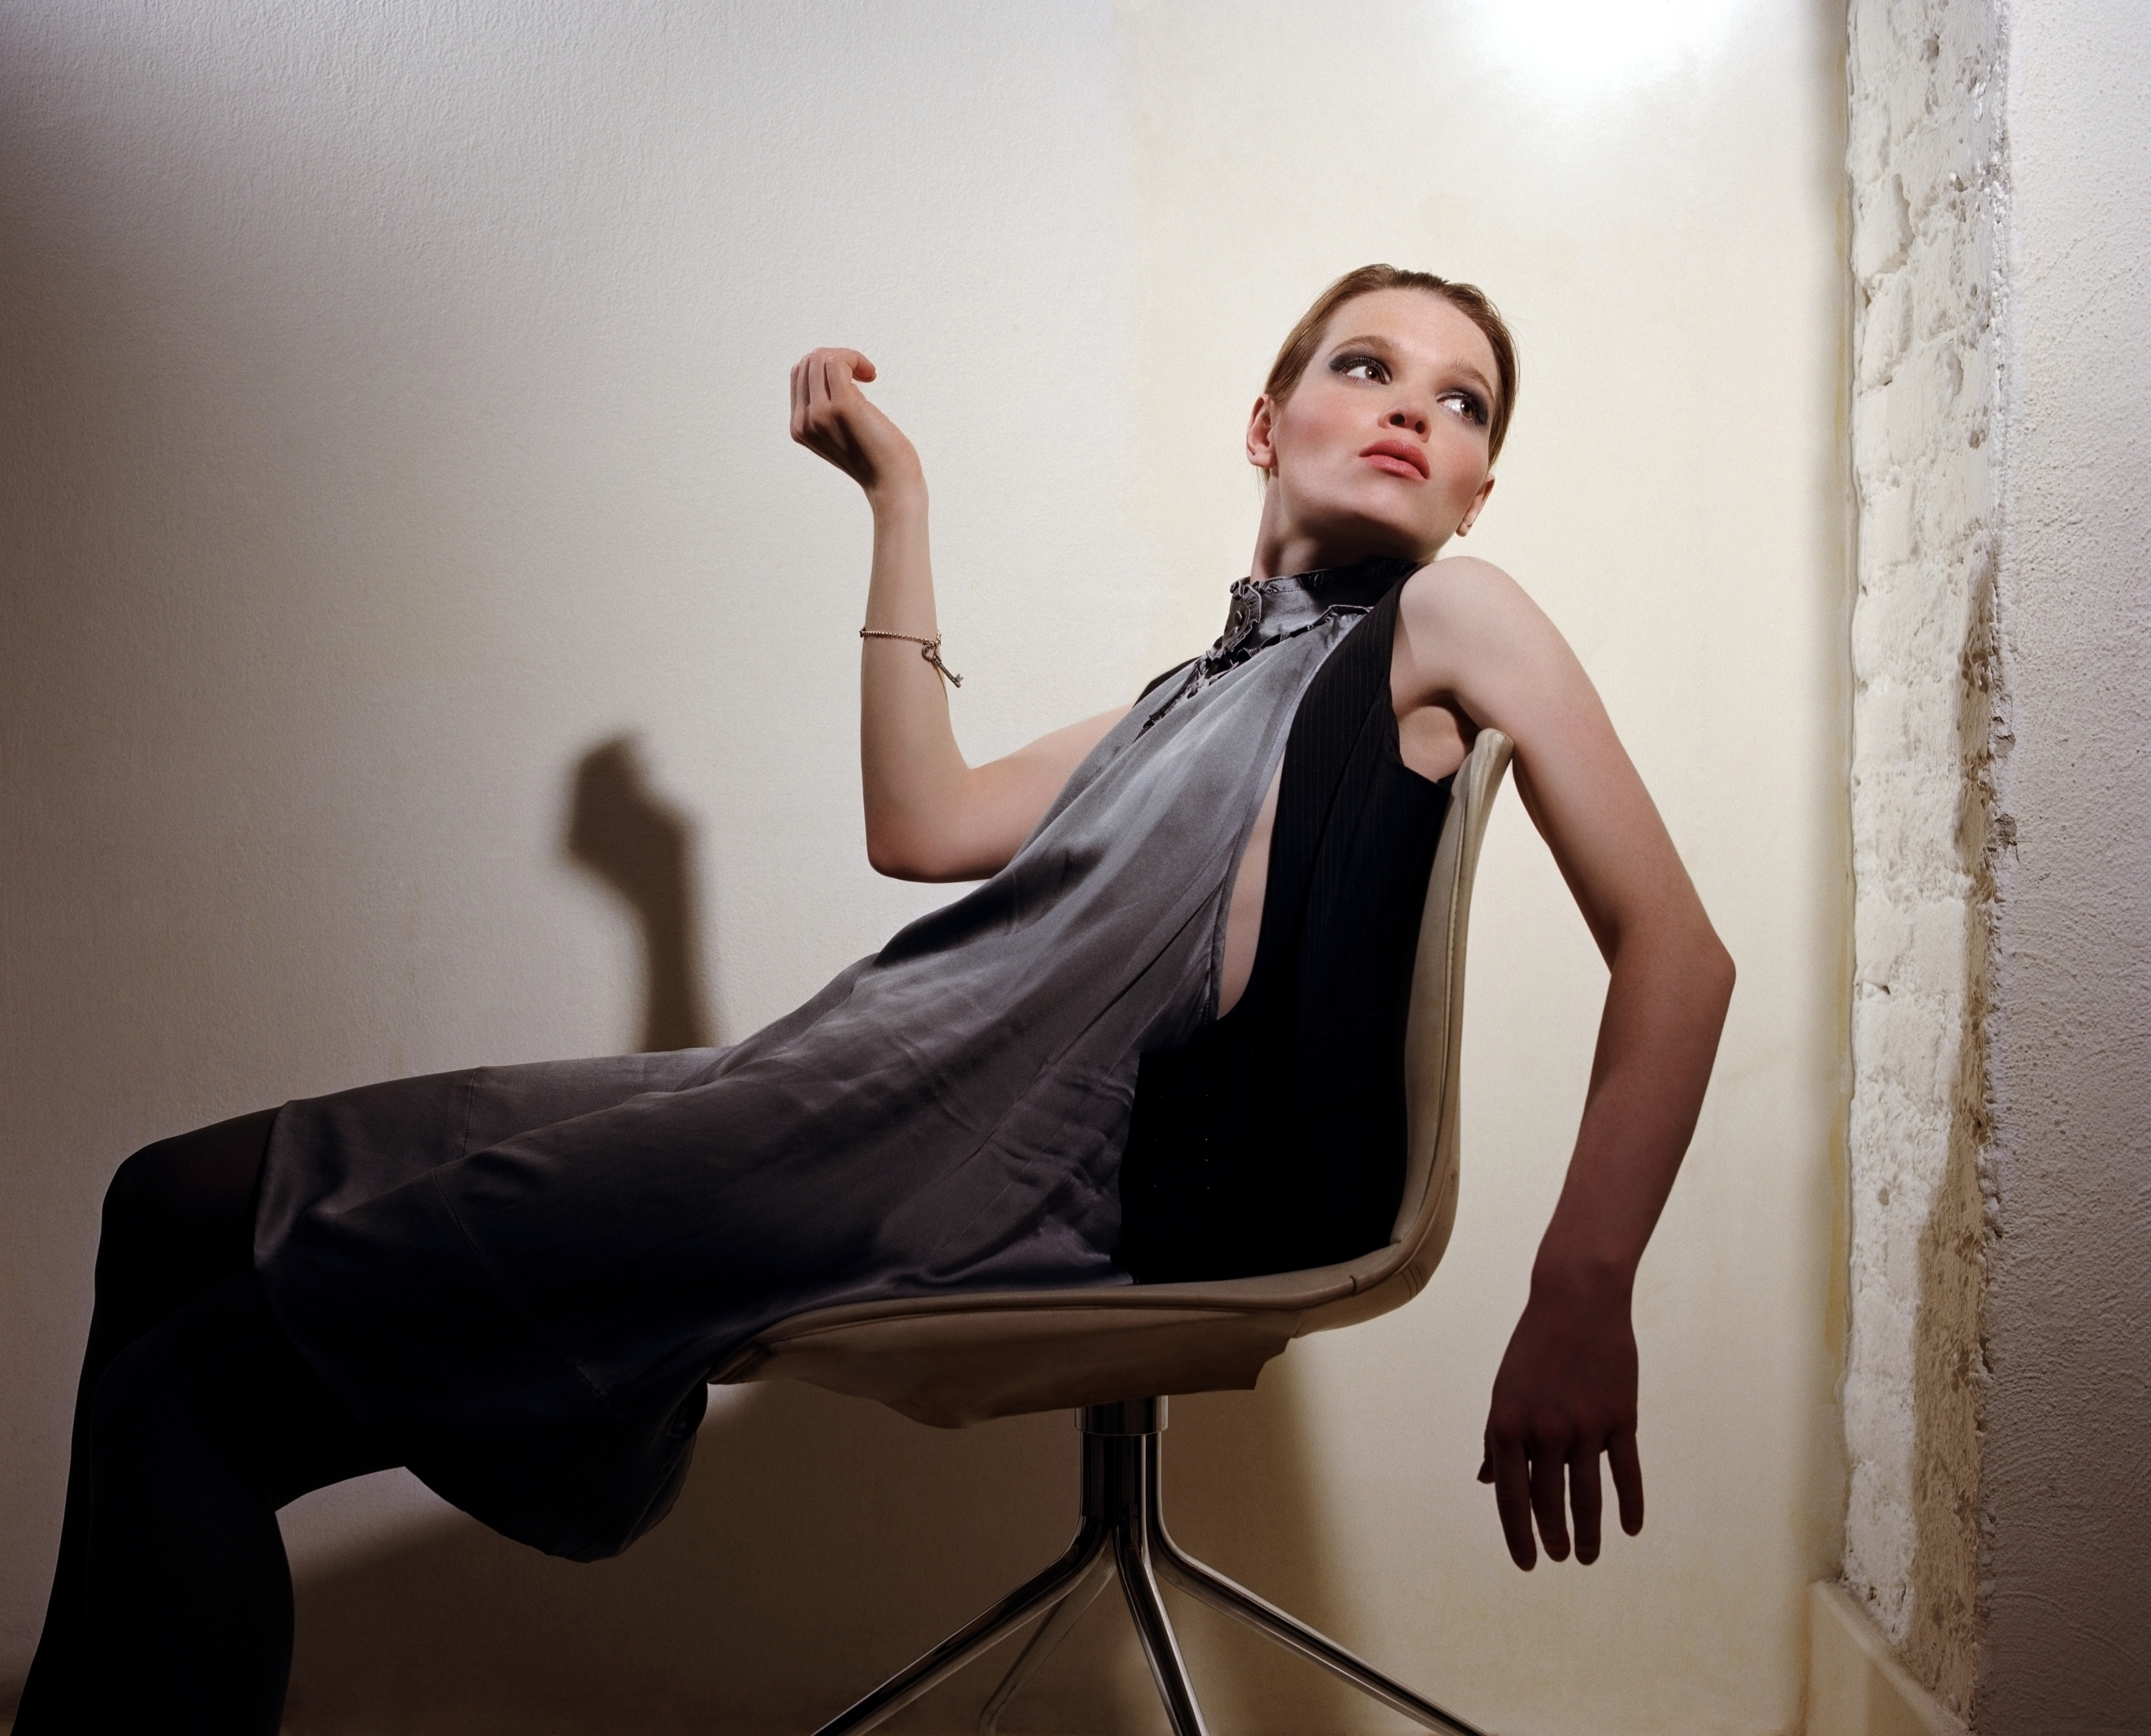 Karoline Herfurth - Vanity Fair (August 6, 2007) HQ